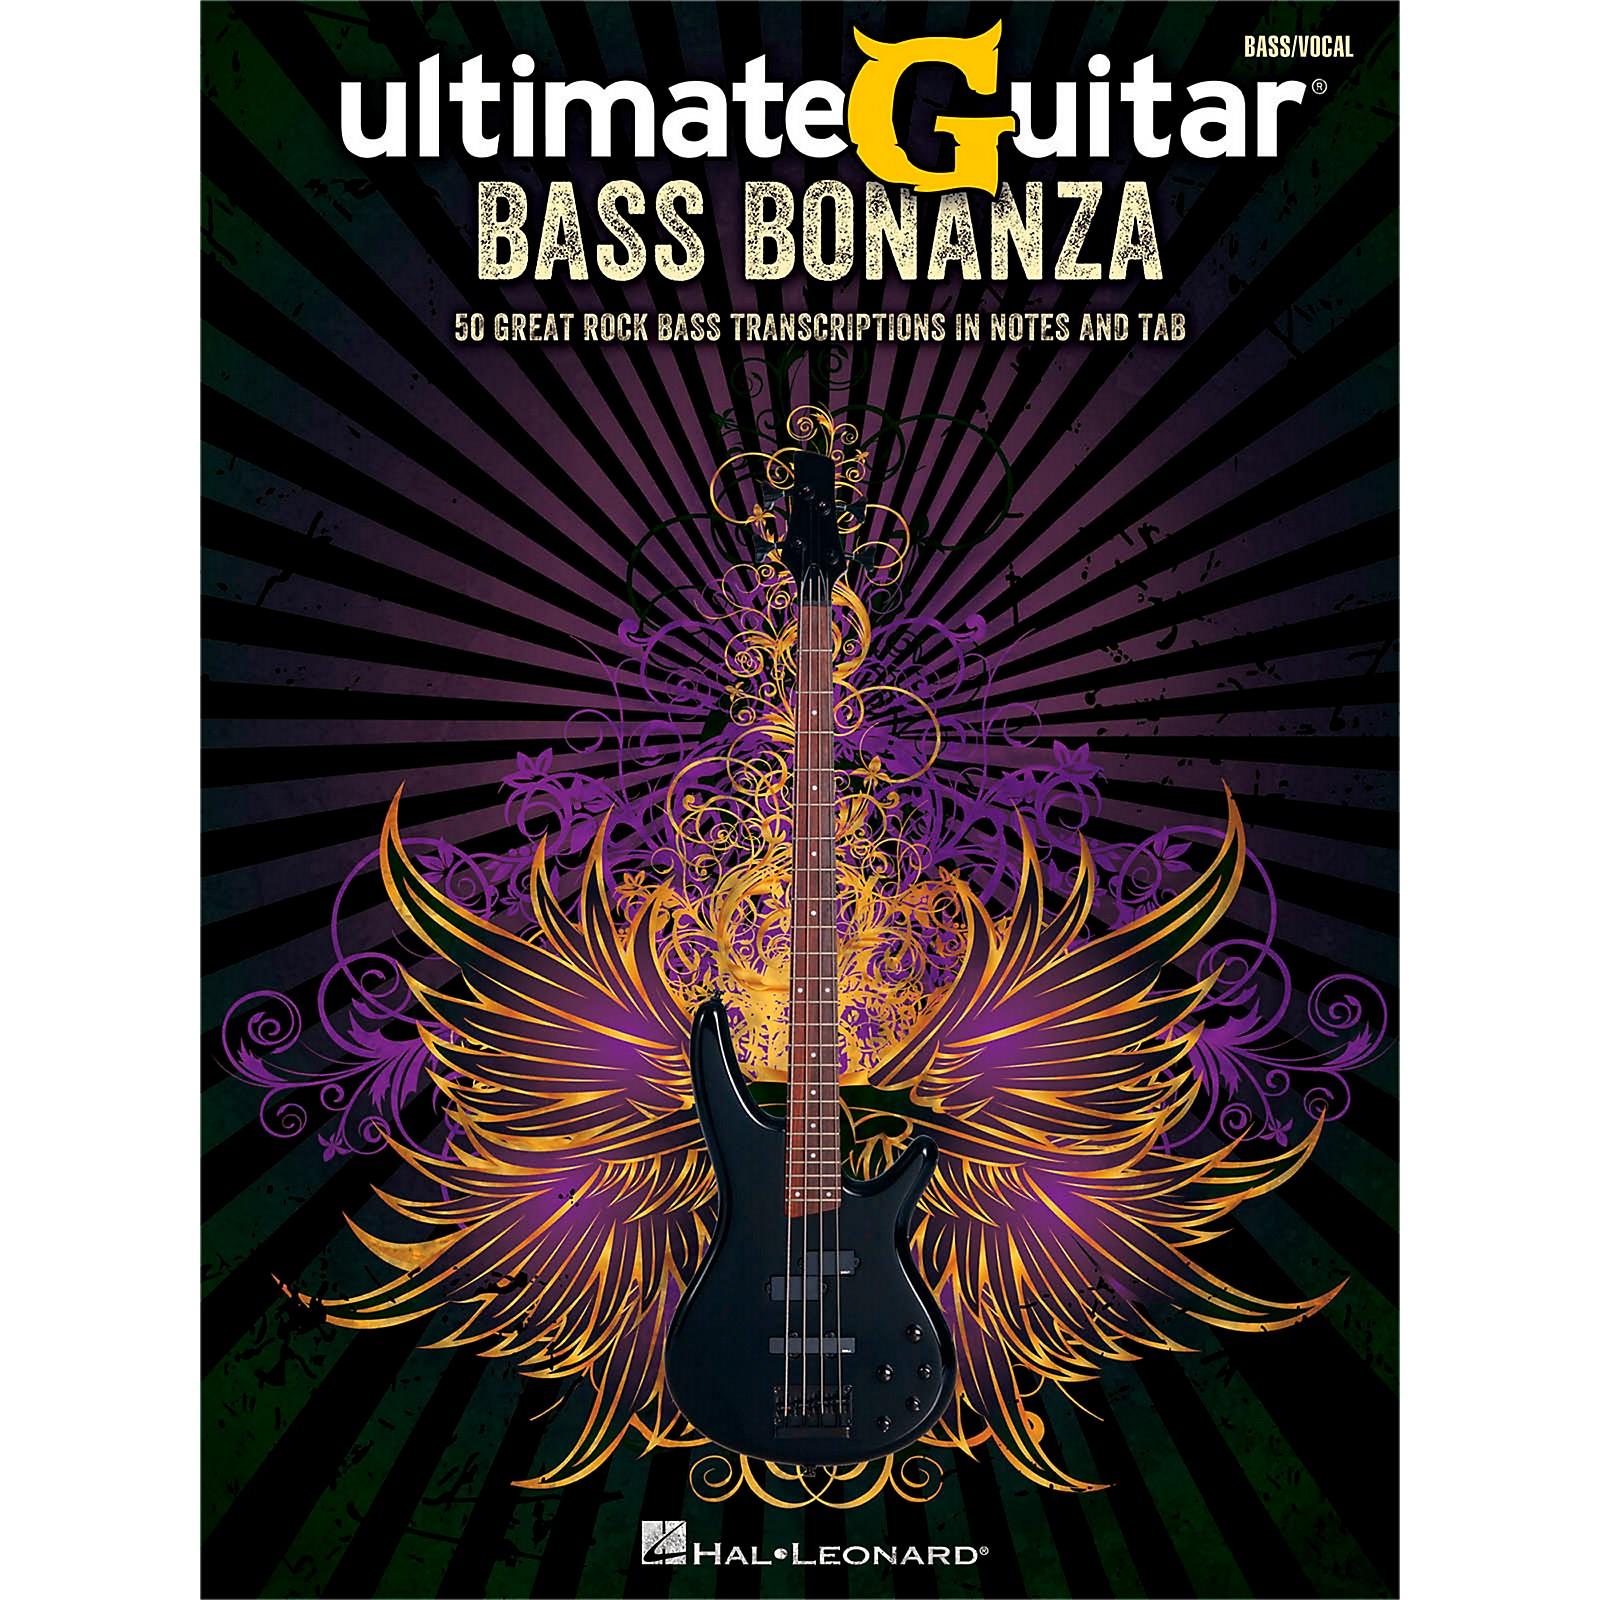 Hal Leonard Ultimate Guitar Bass Bonanza Bass Tab Songbook